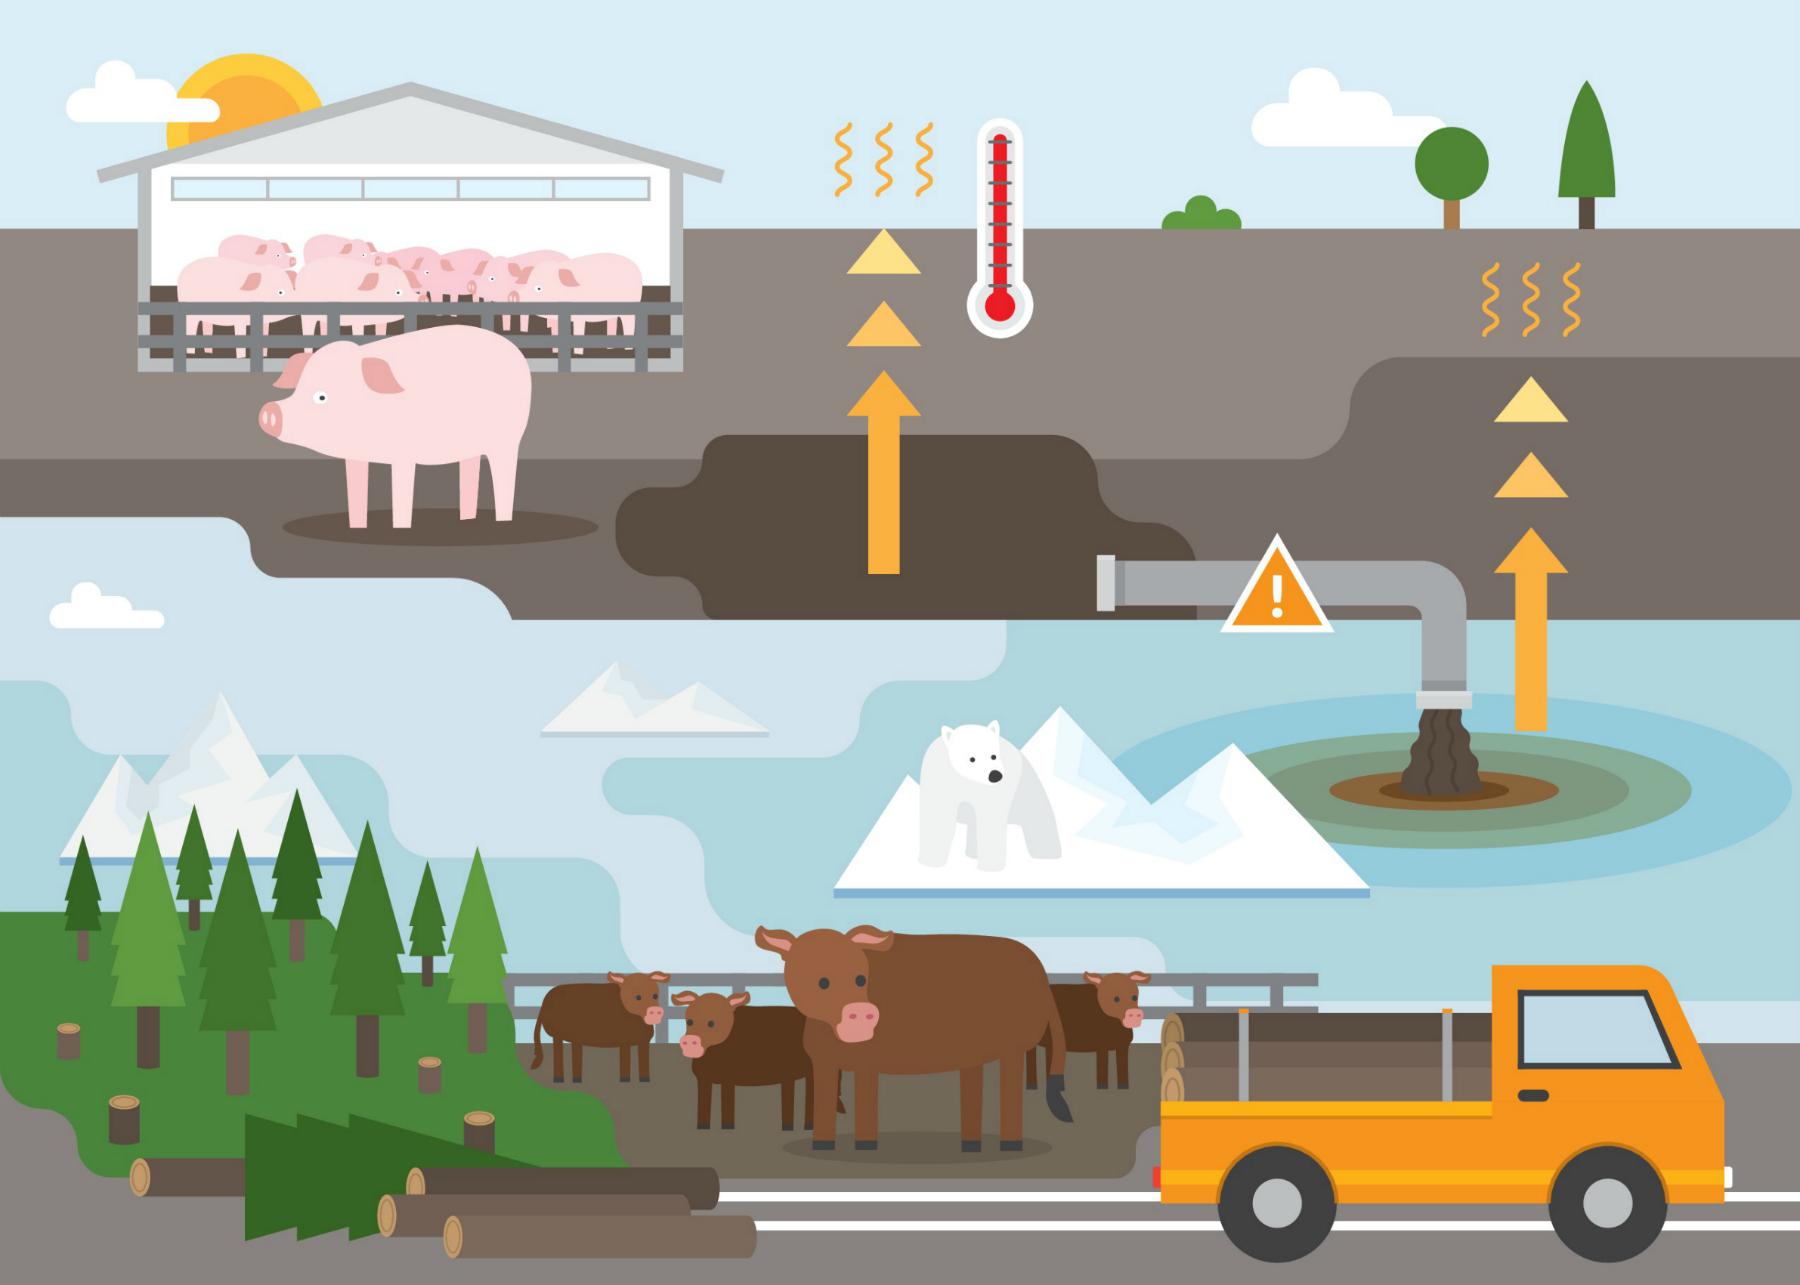 Vertical explainer photo 2 - Environmental Curriculum Infographic